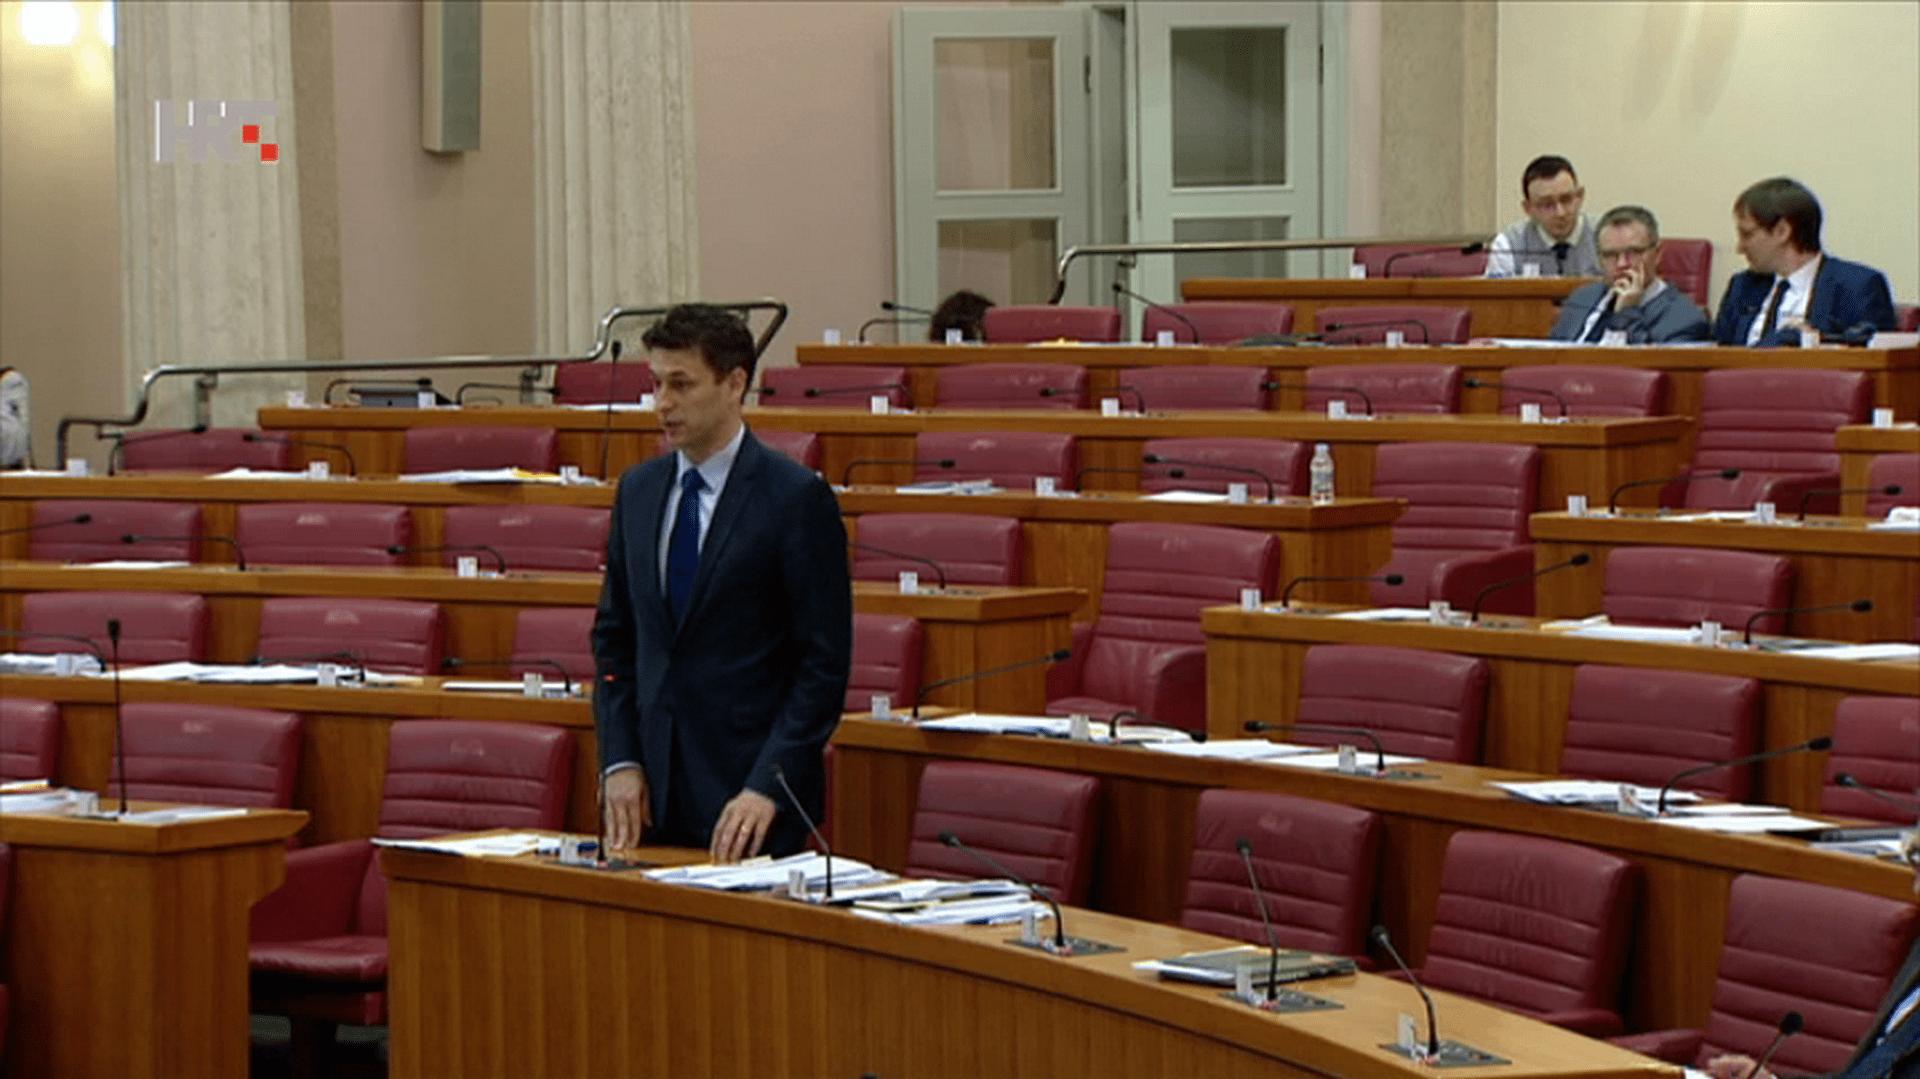 Božo Petrov presidente de Most.(Foto: HRT.hr)